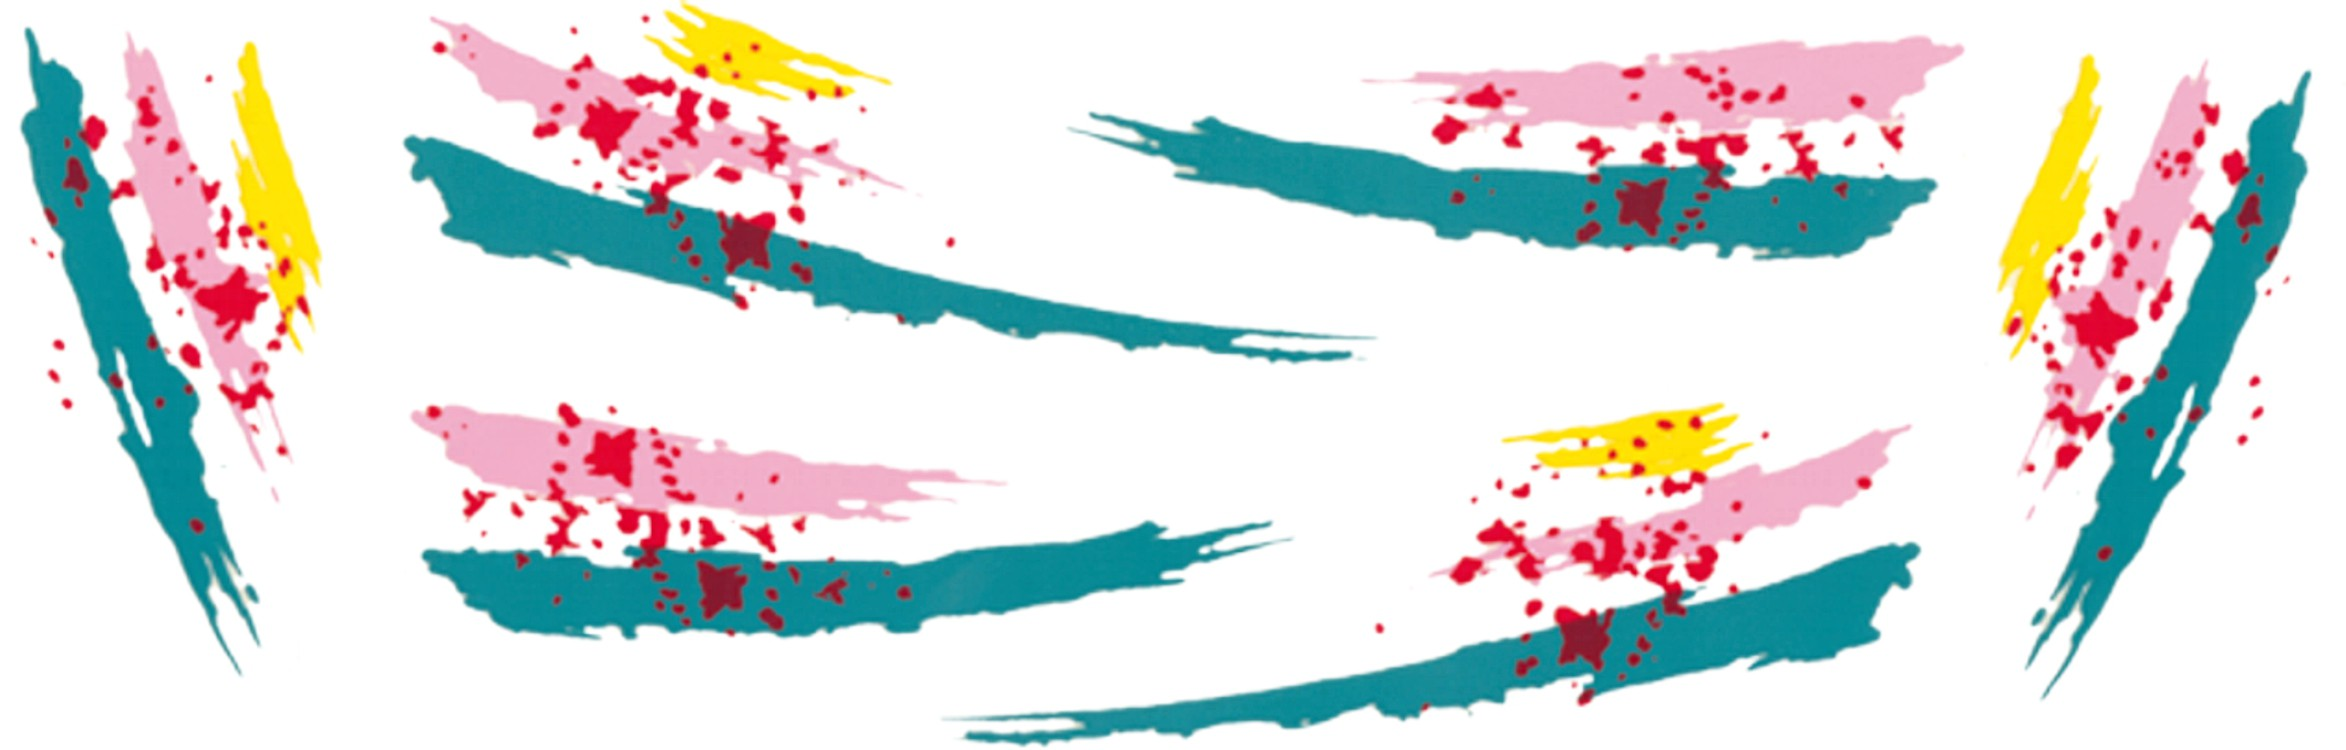 Graffity-universal-deco brush marks – Bild 1